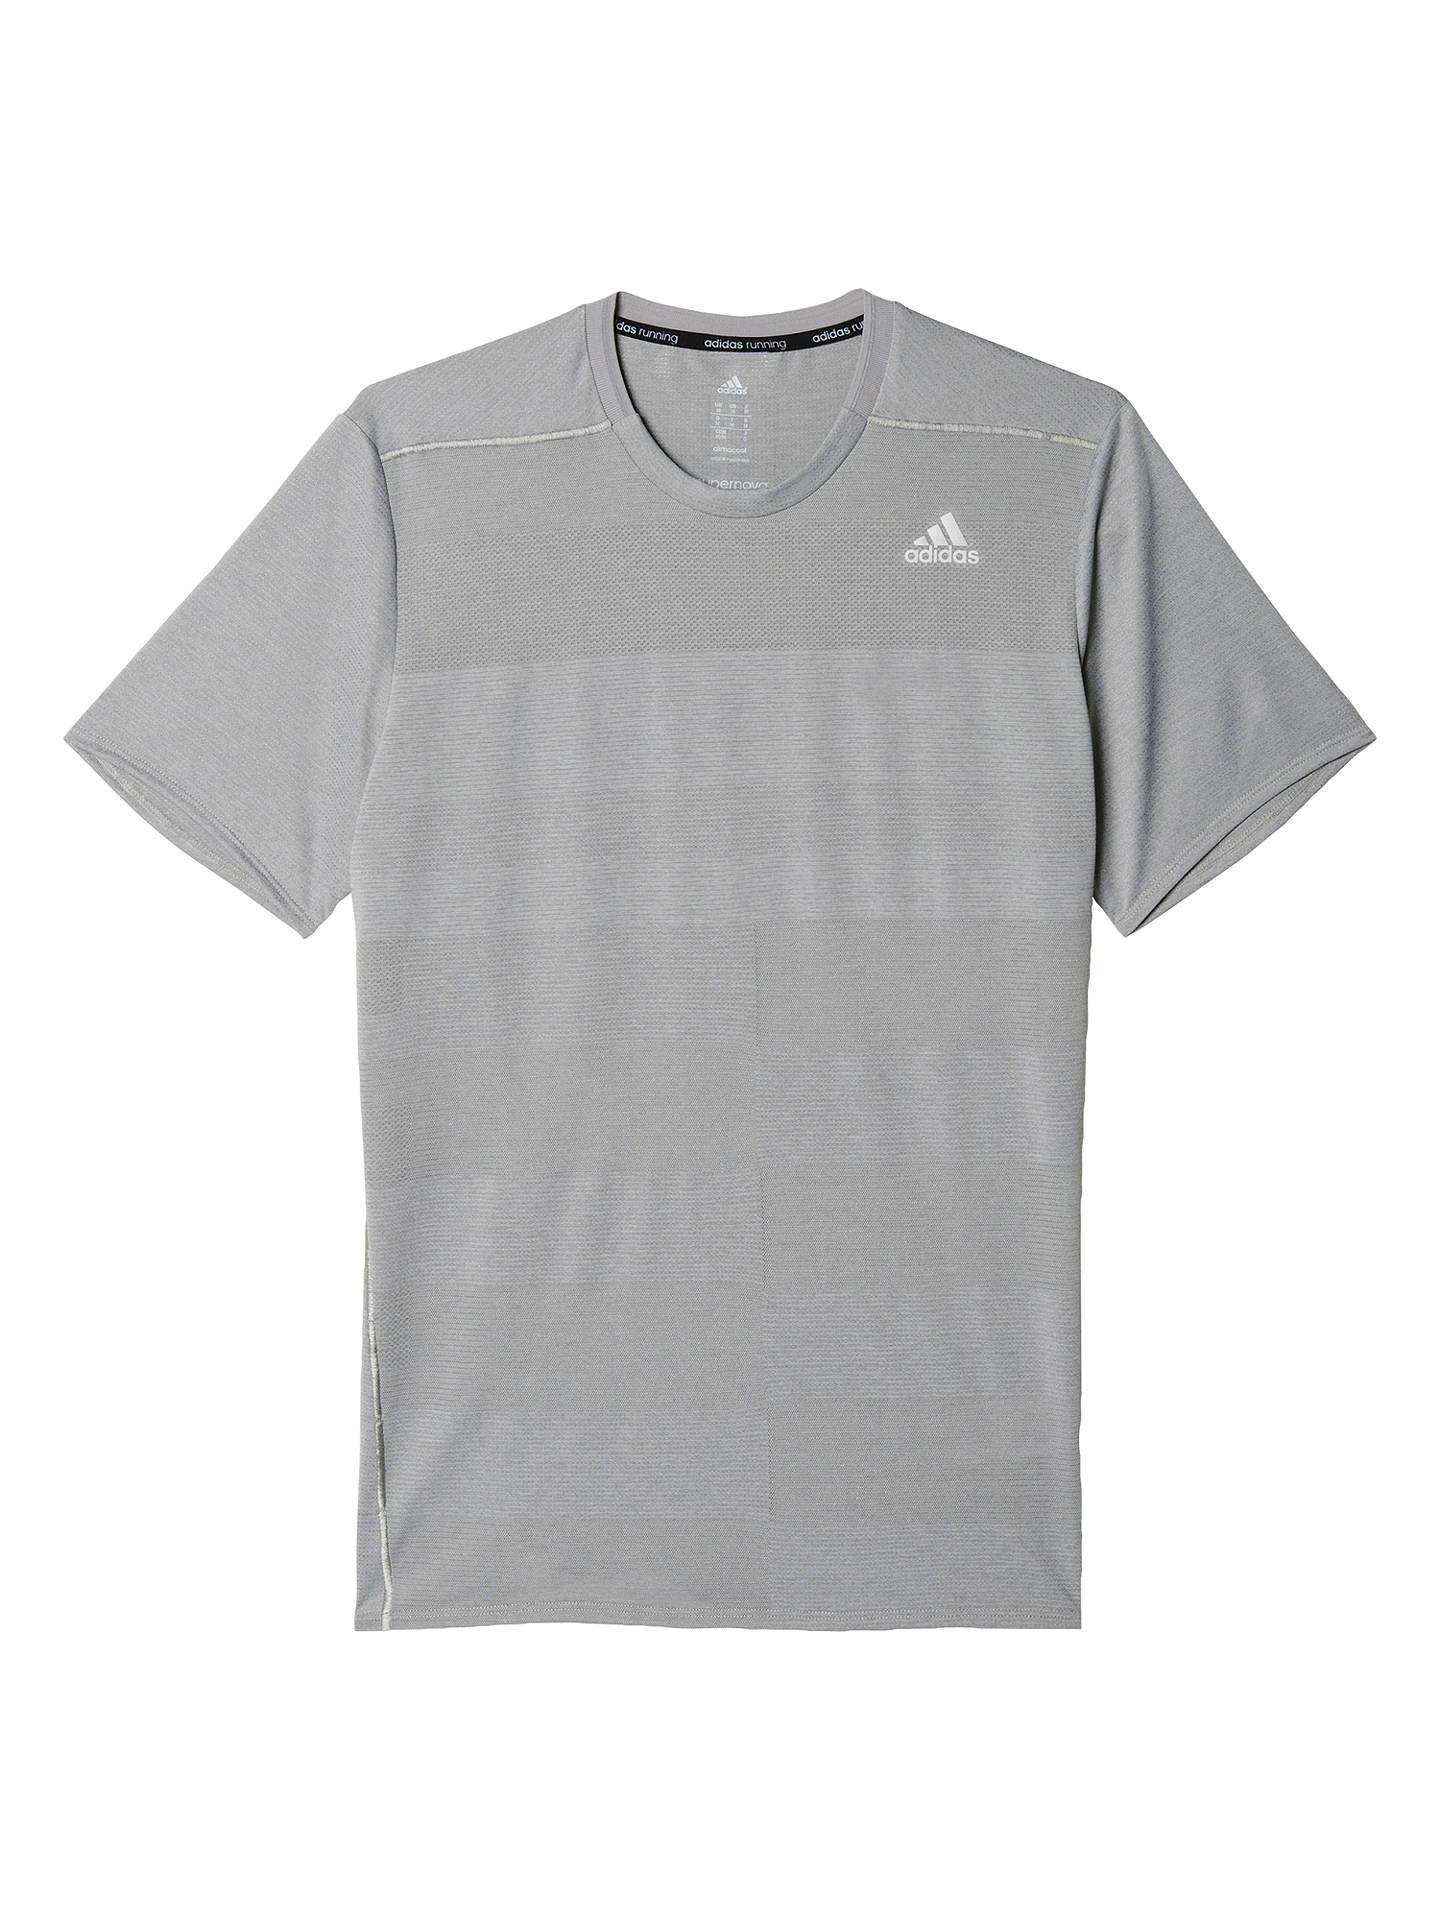 61a459cc Buy Adidas Supernova Short Sleeve Running Top, Grey, S Online at  johnlewis.com ...